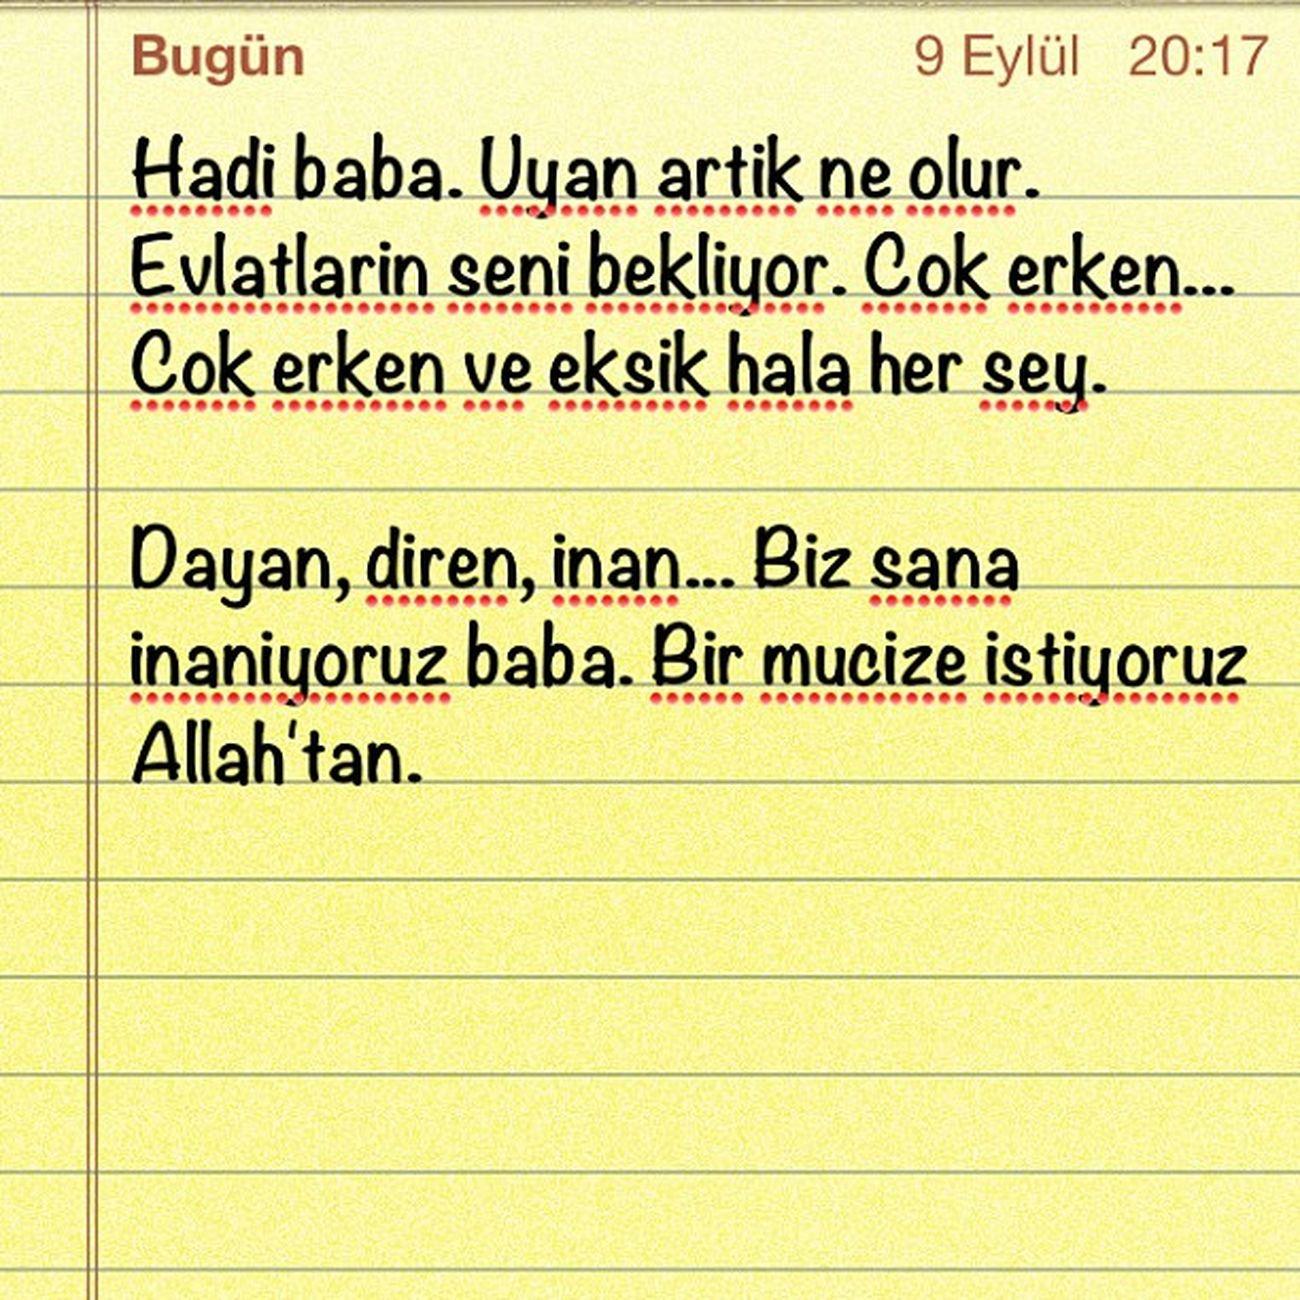 Babam.... Kendimenot Istanbul Acibadem Hastane ailehastanesi